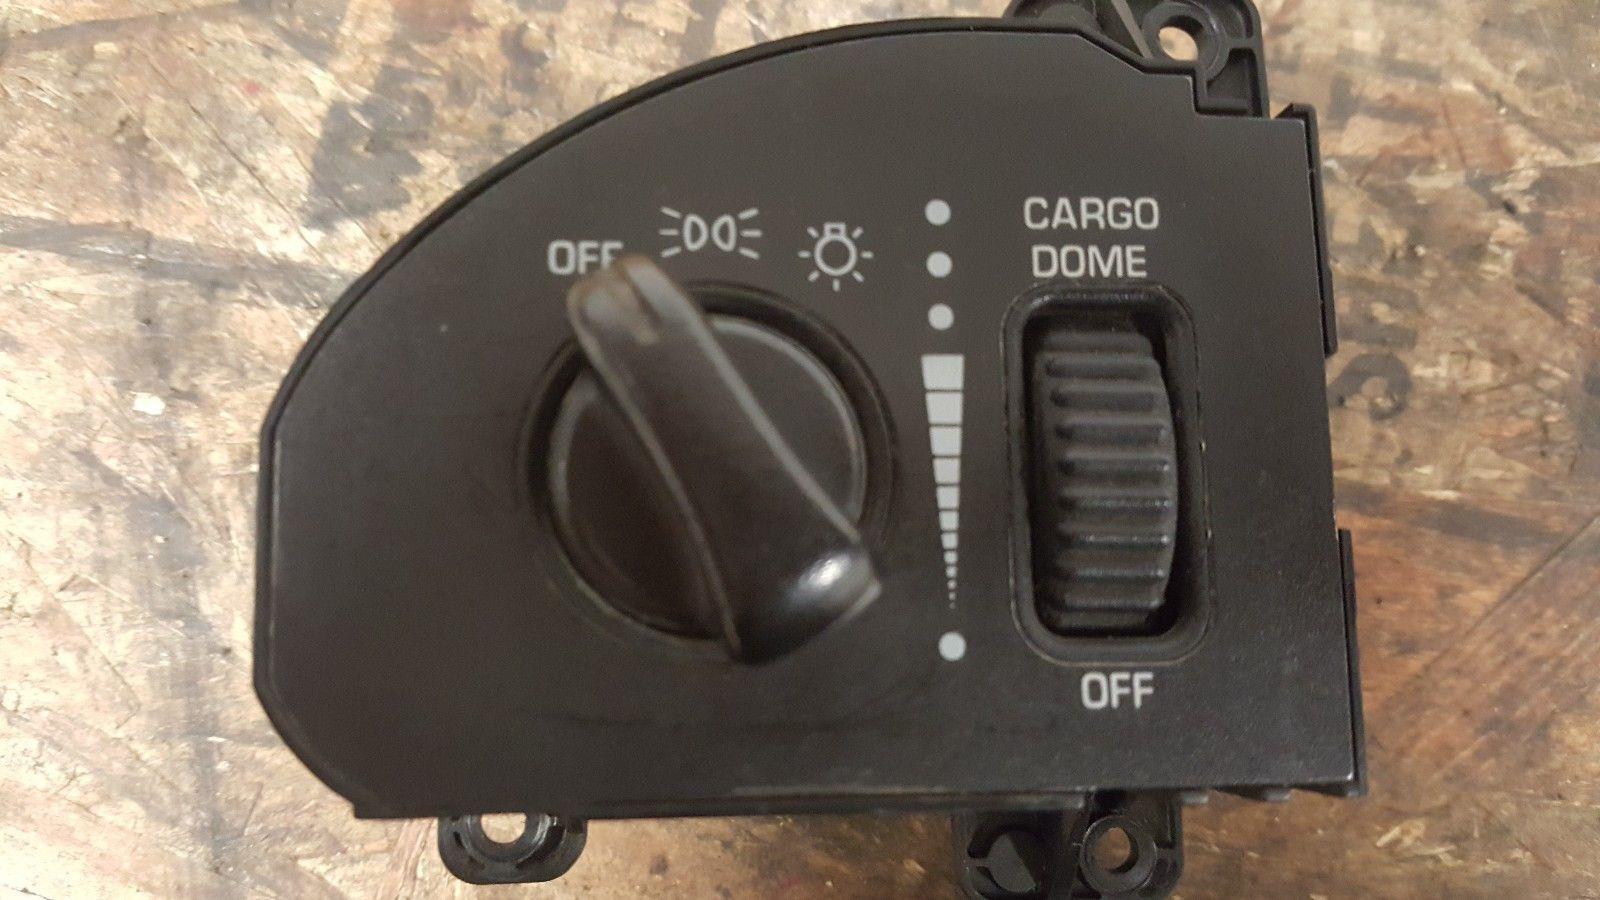 1998 dodge ram 2500 headlight switch wiring diagram ceiling fan capacitor 2002 3500 ebay